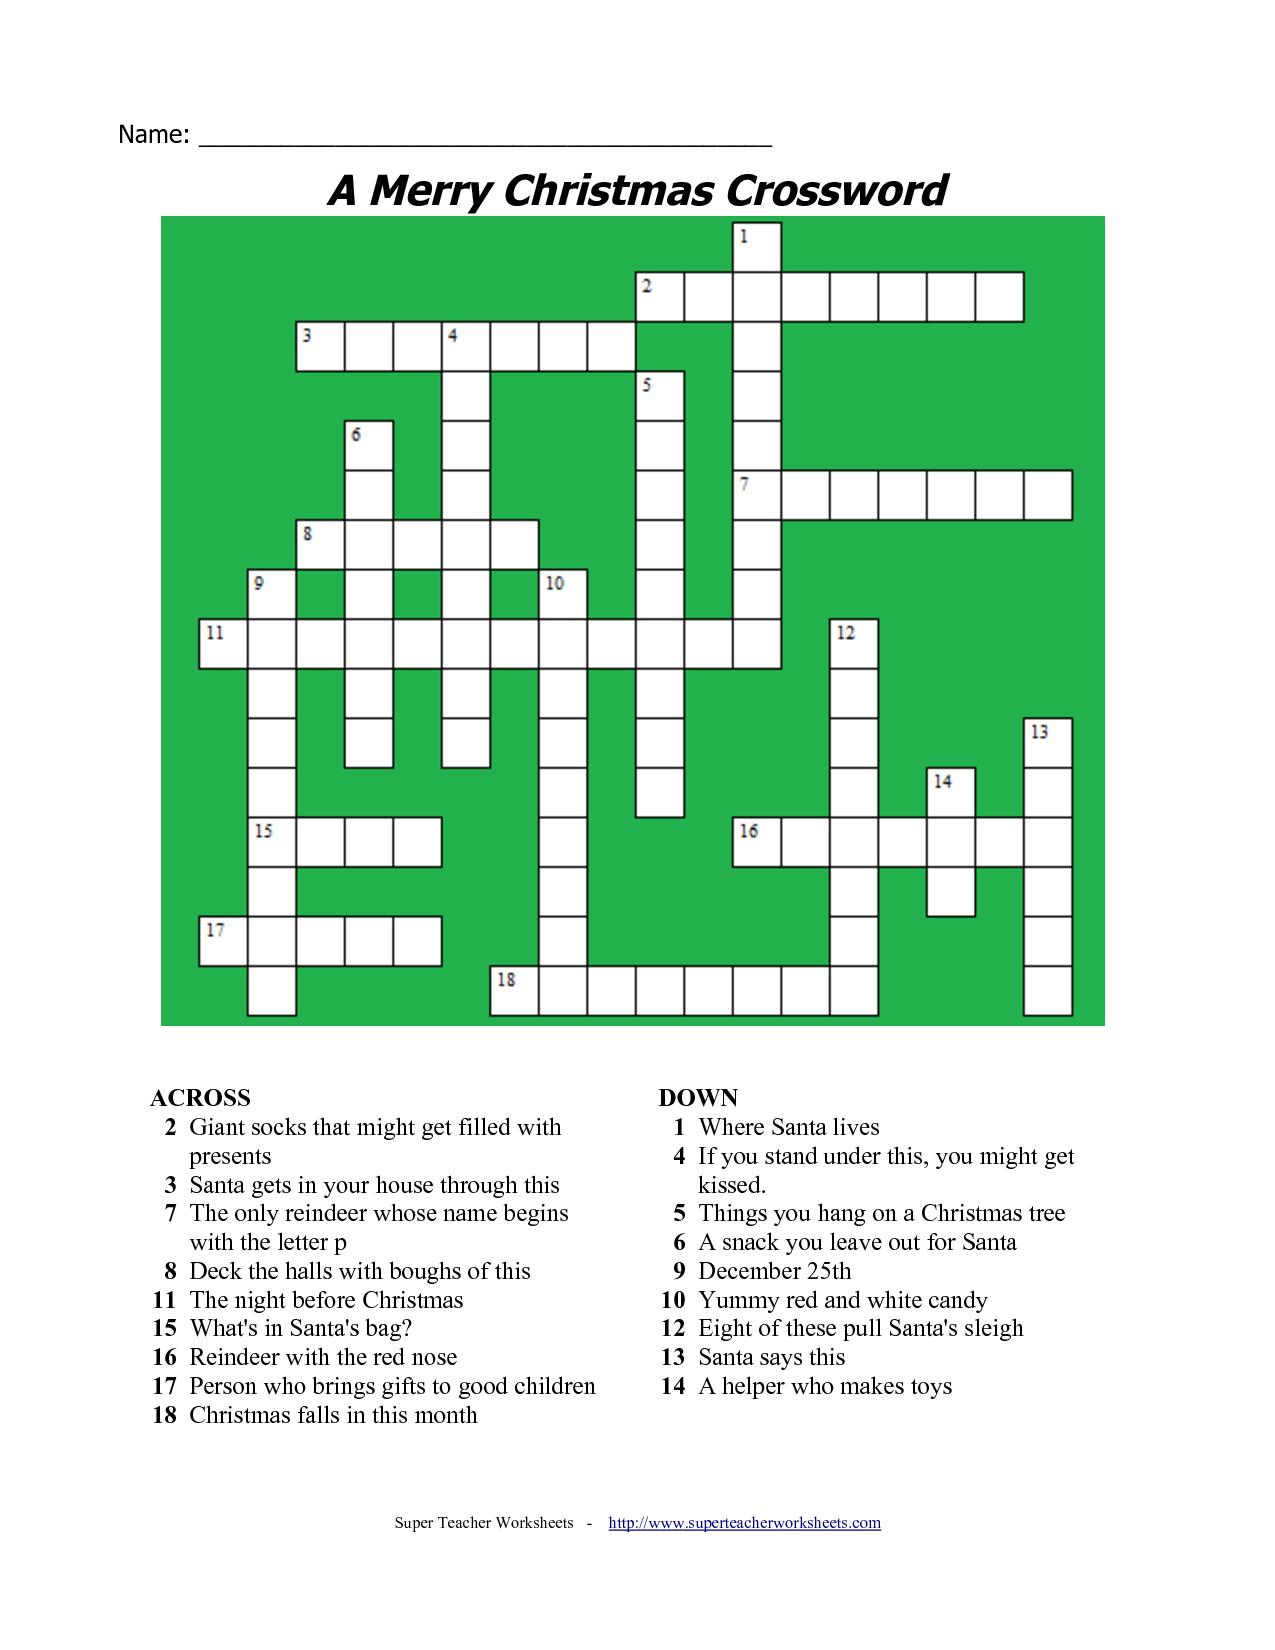 20 Fun Printable Christmas Crossword Puzzles | Kittybabylove - Printable Christmas Crossword Puzzles Pdf